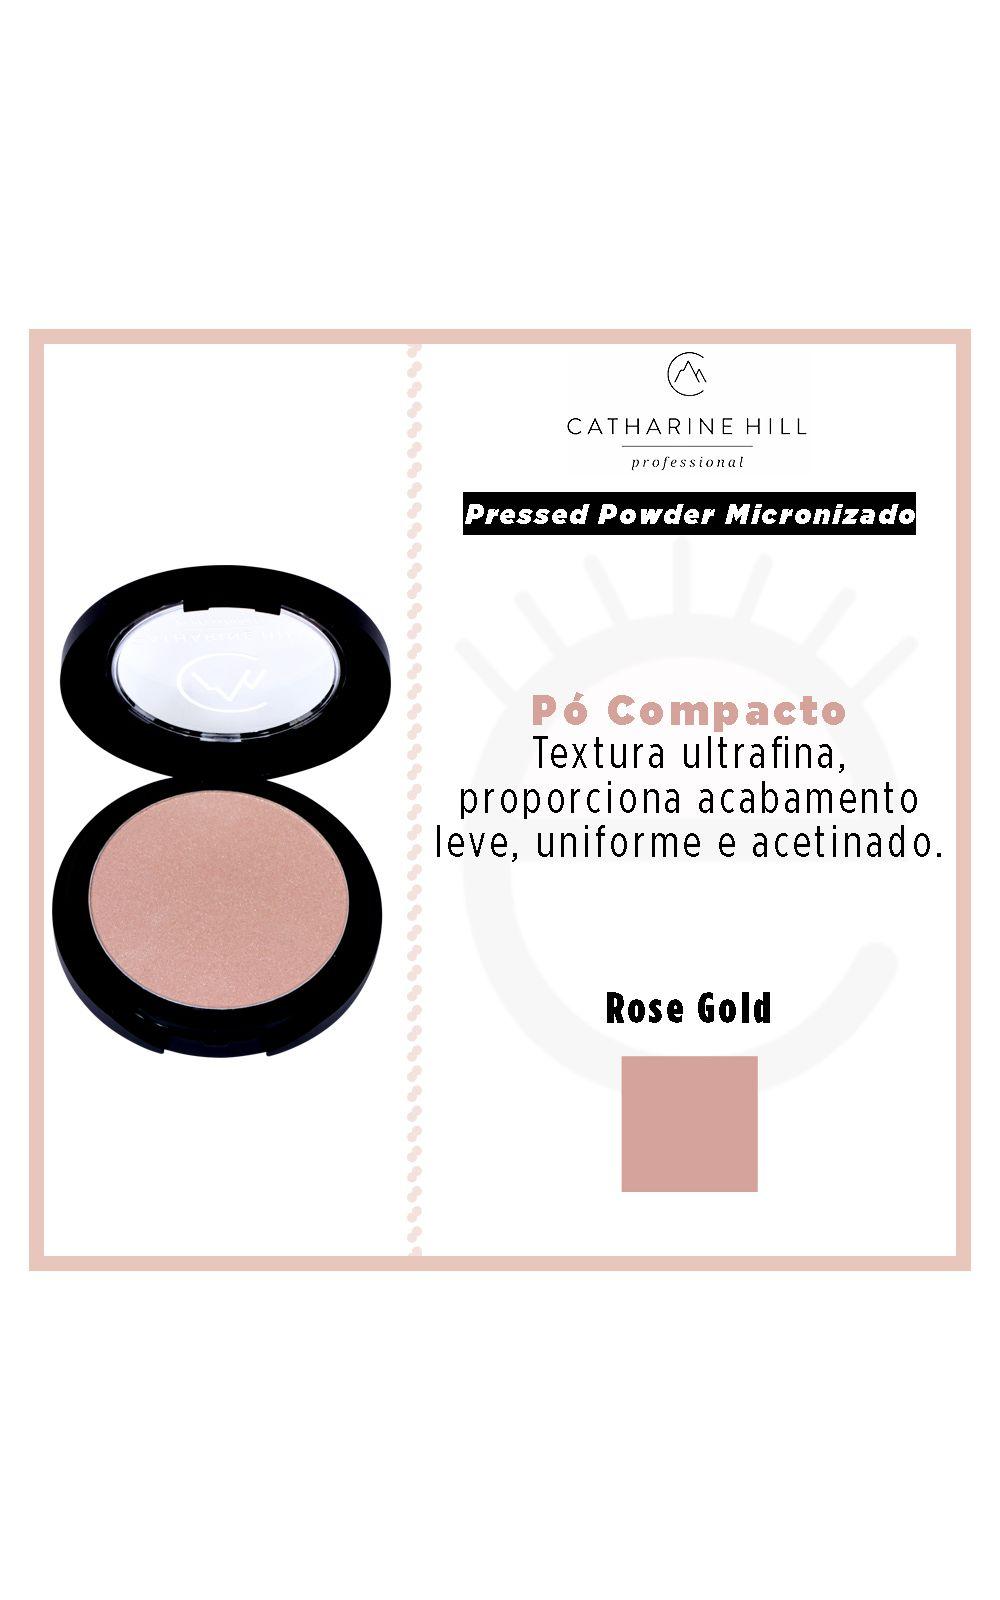 Foto 4 - Pó Compacto Catharine Hill Pressed Powder Micronizado - Rose Gold - Rose Gold